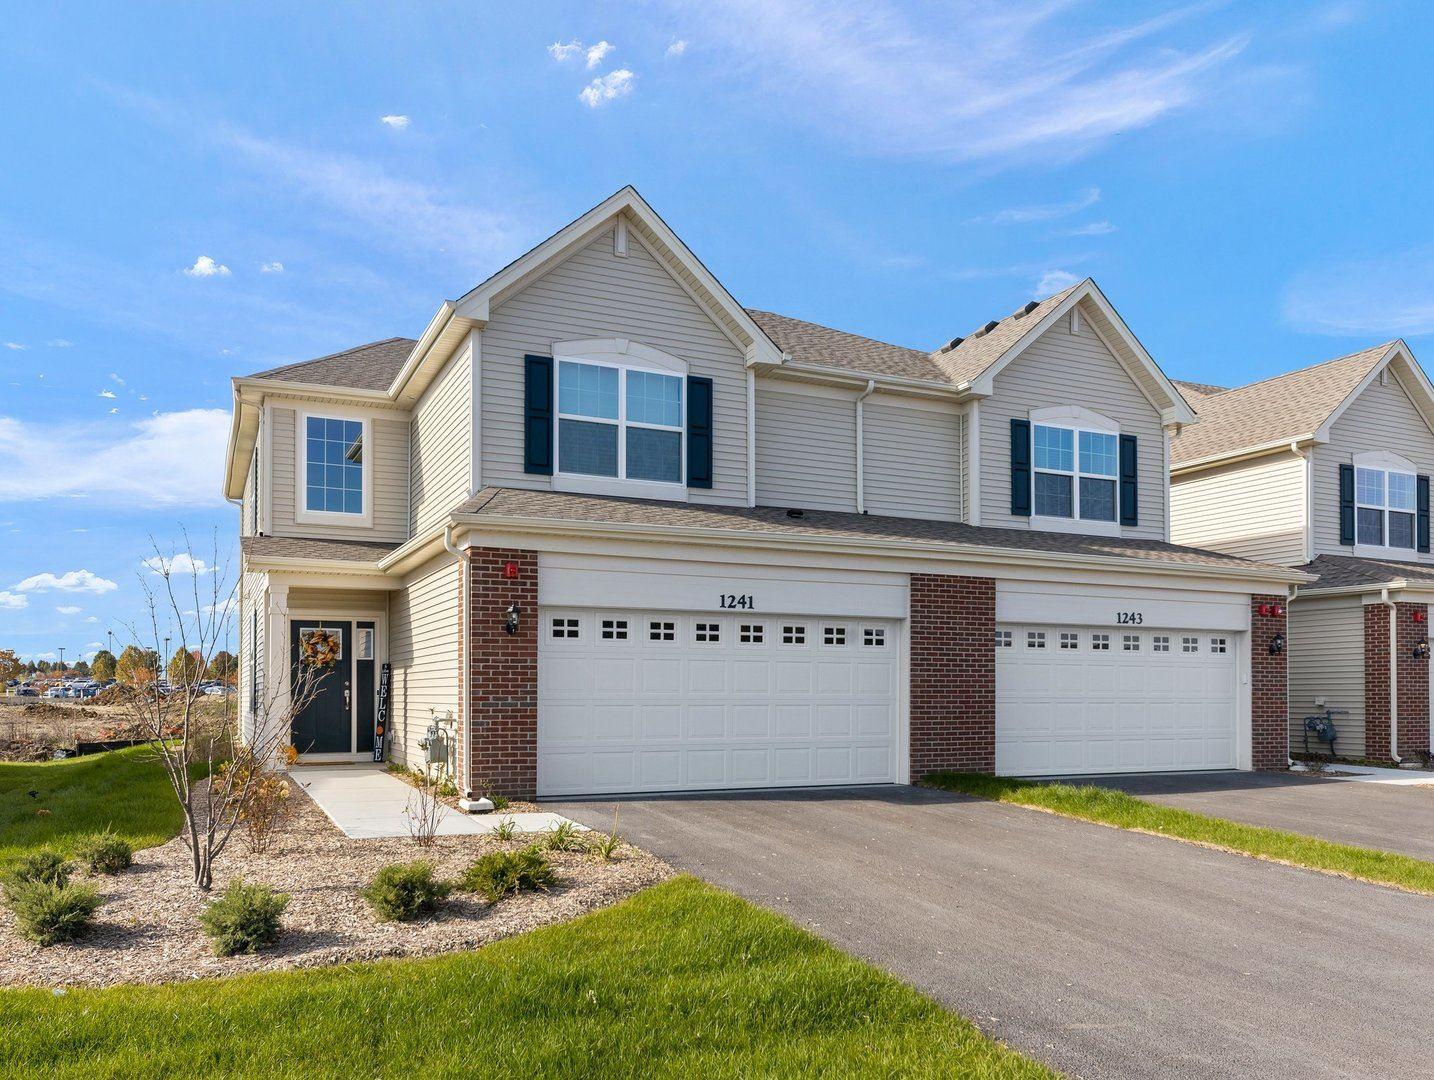 1163 Hawk Hollow Drive, Yorkville, IL 60560 - #: 11240364